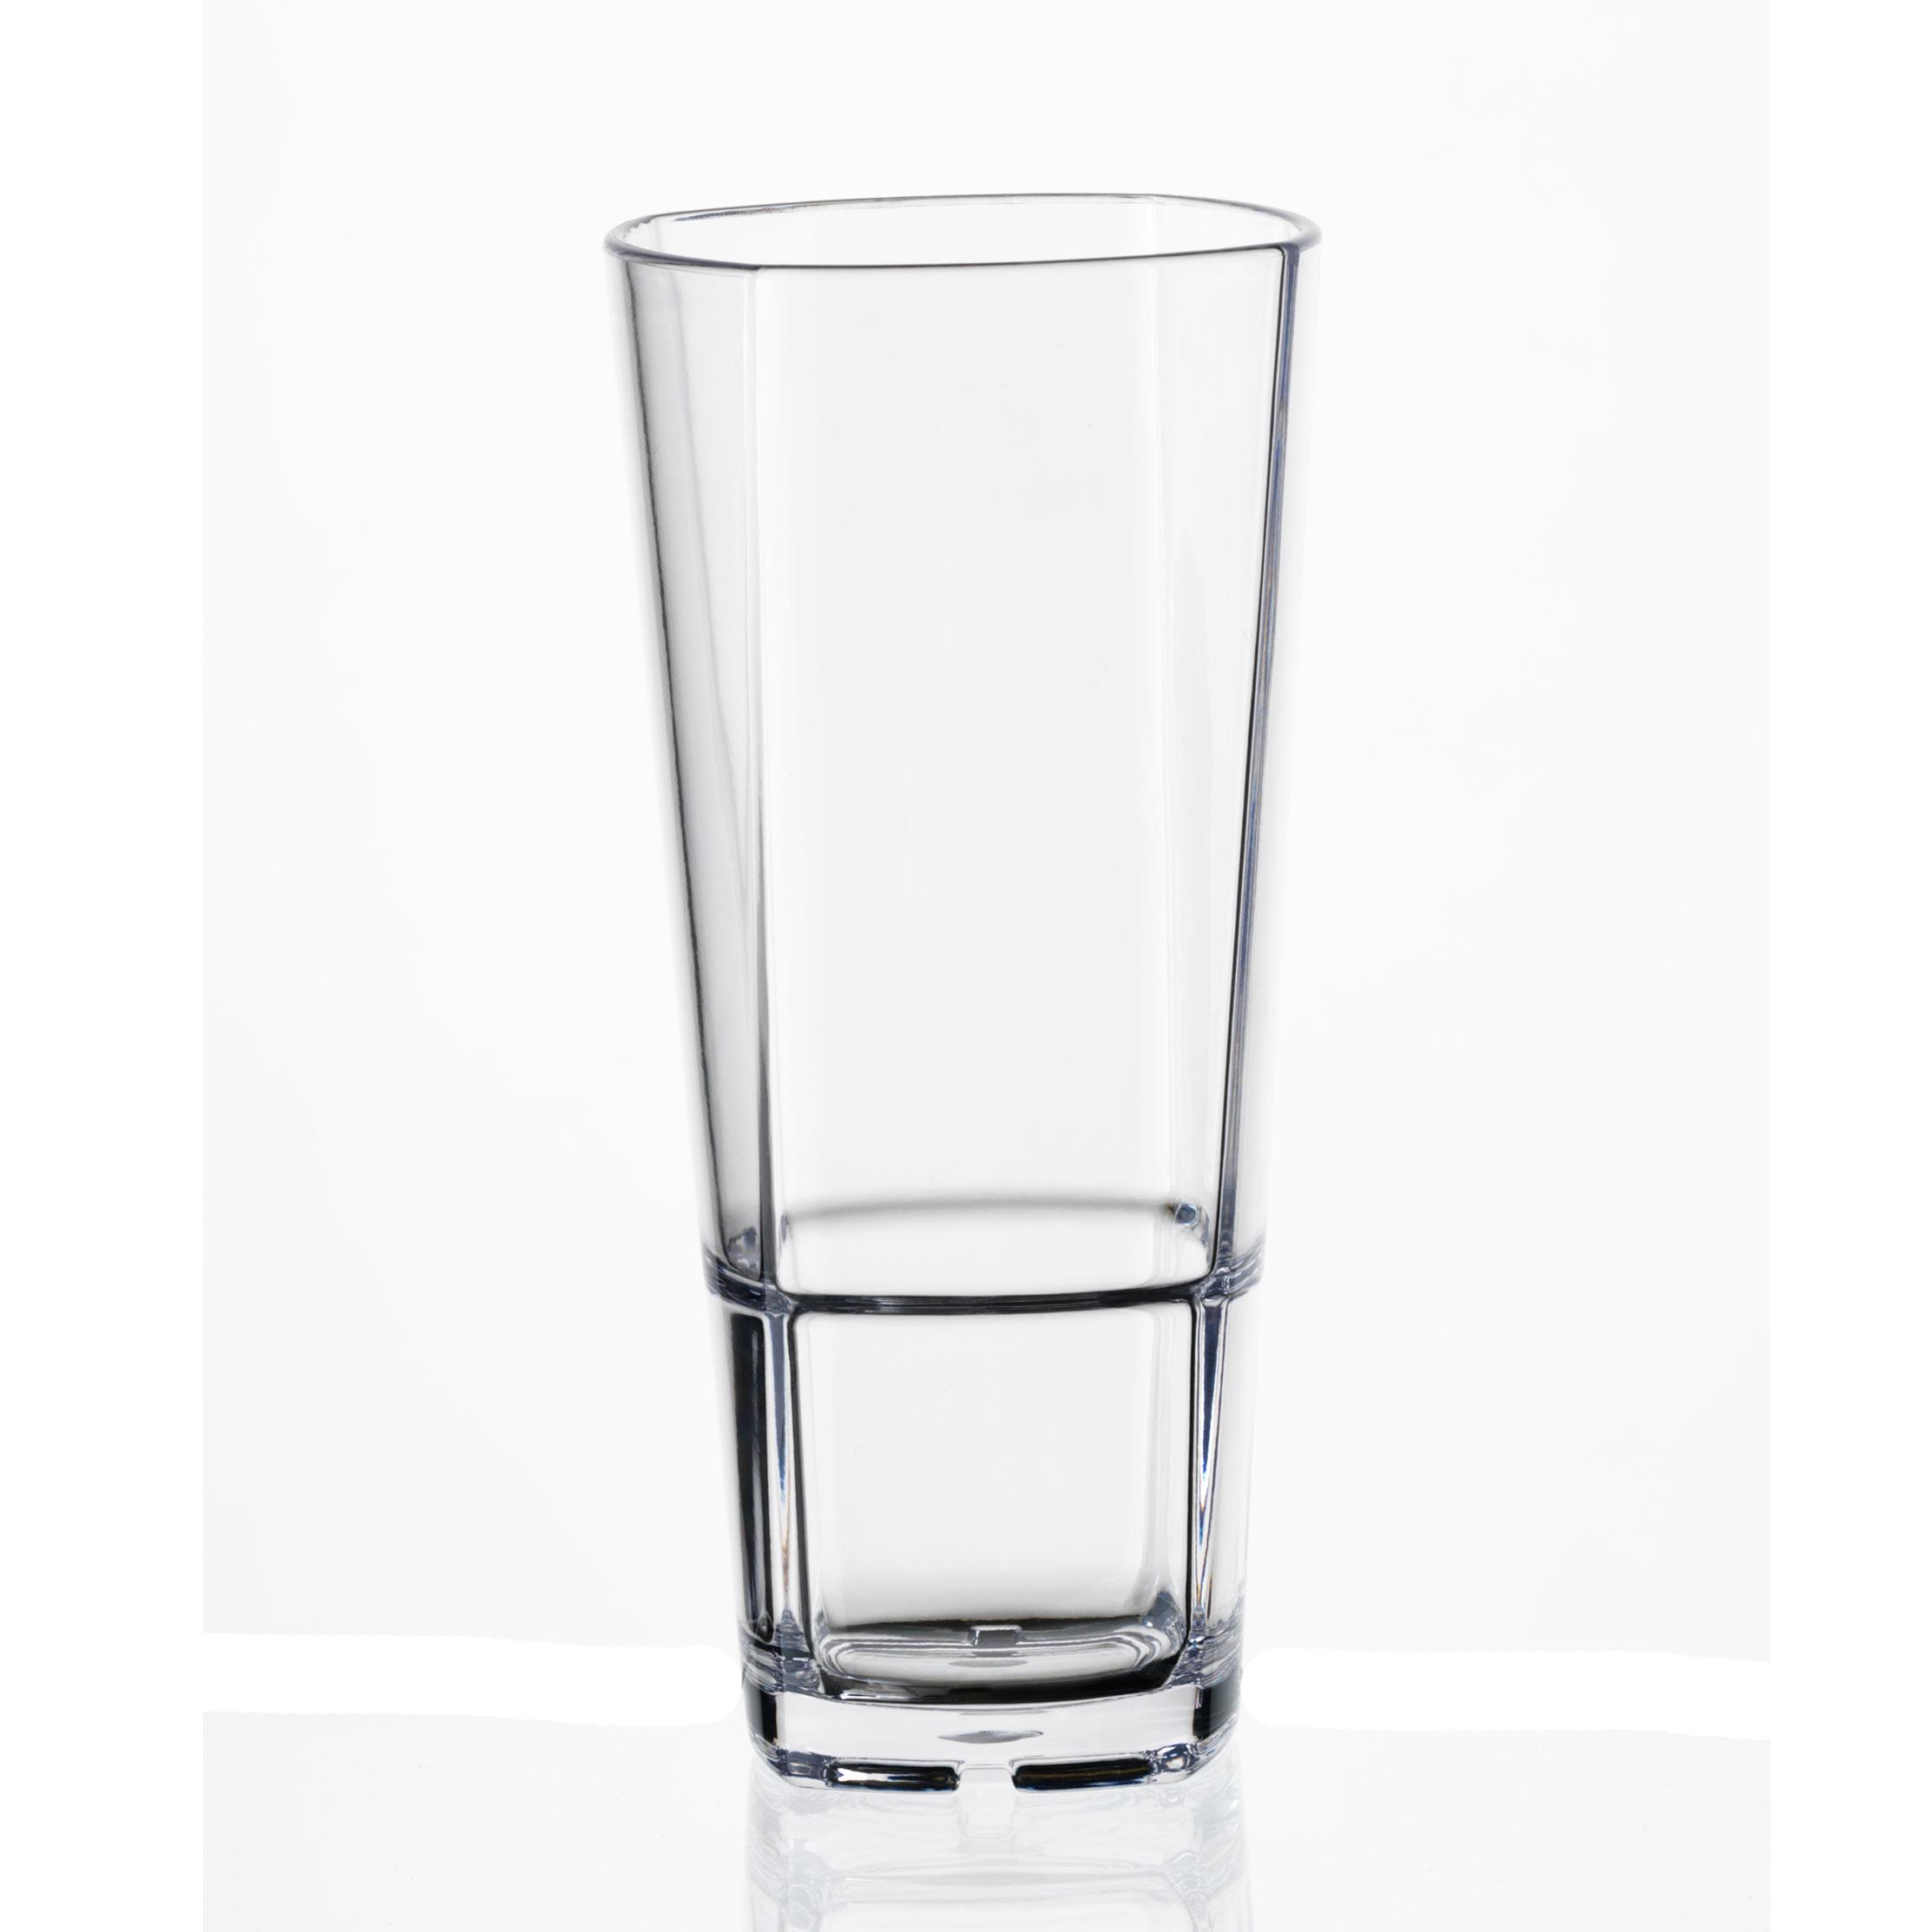 Libbey Glass 92443 glassware, plastic